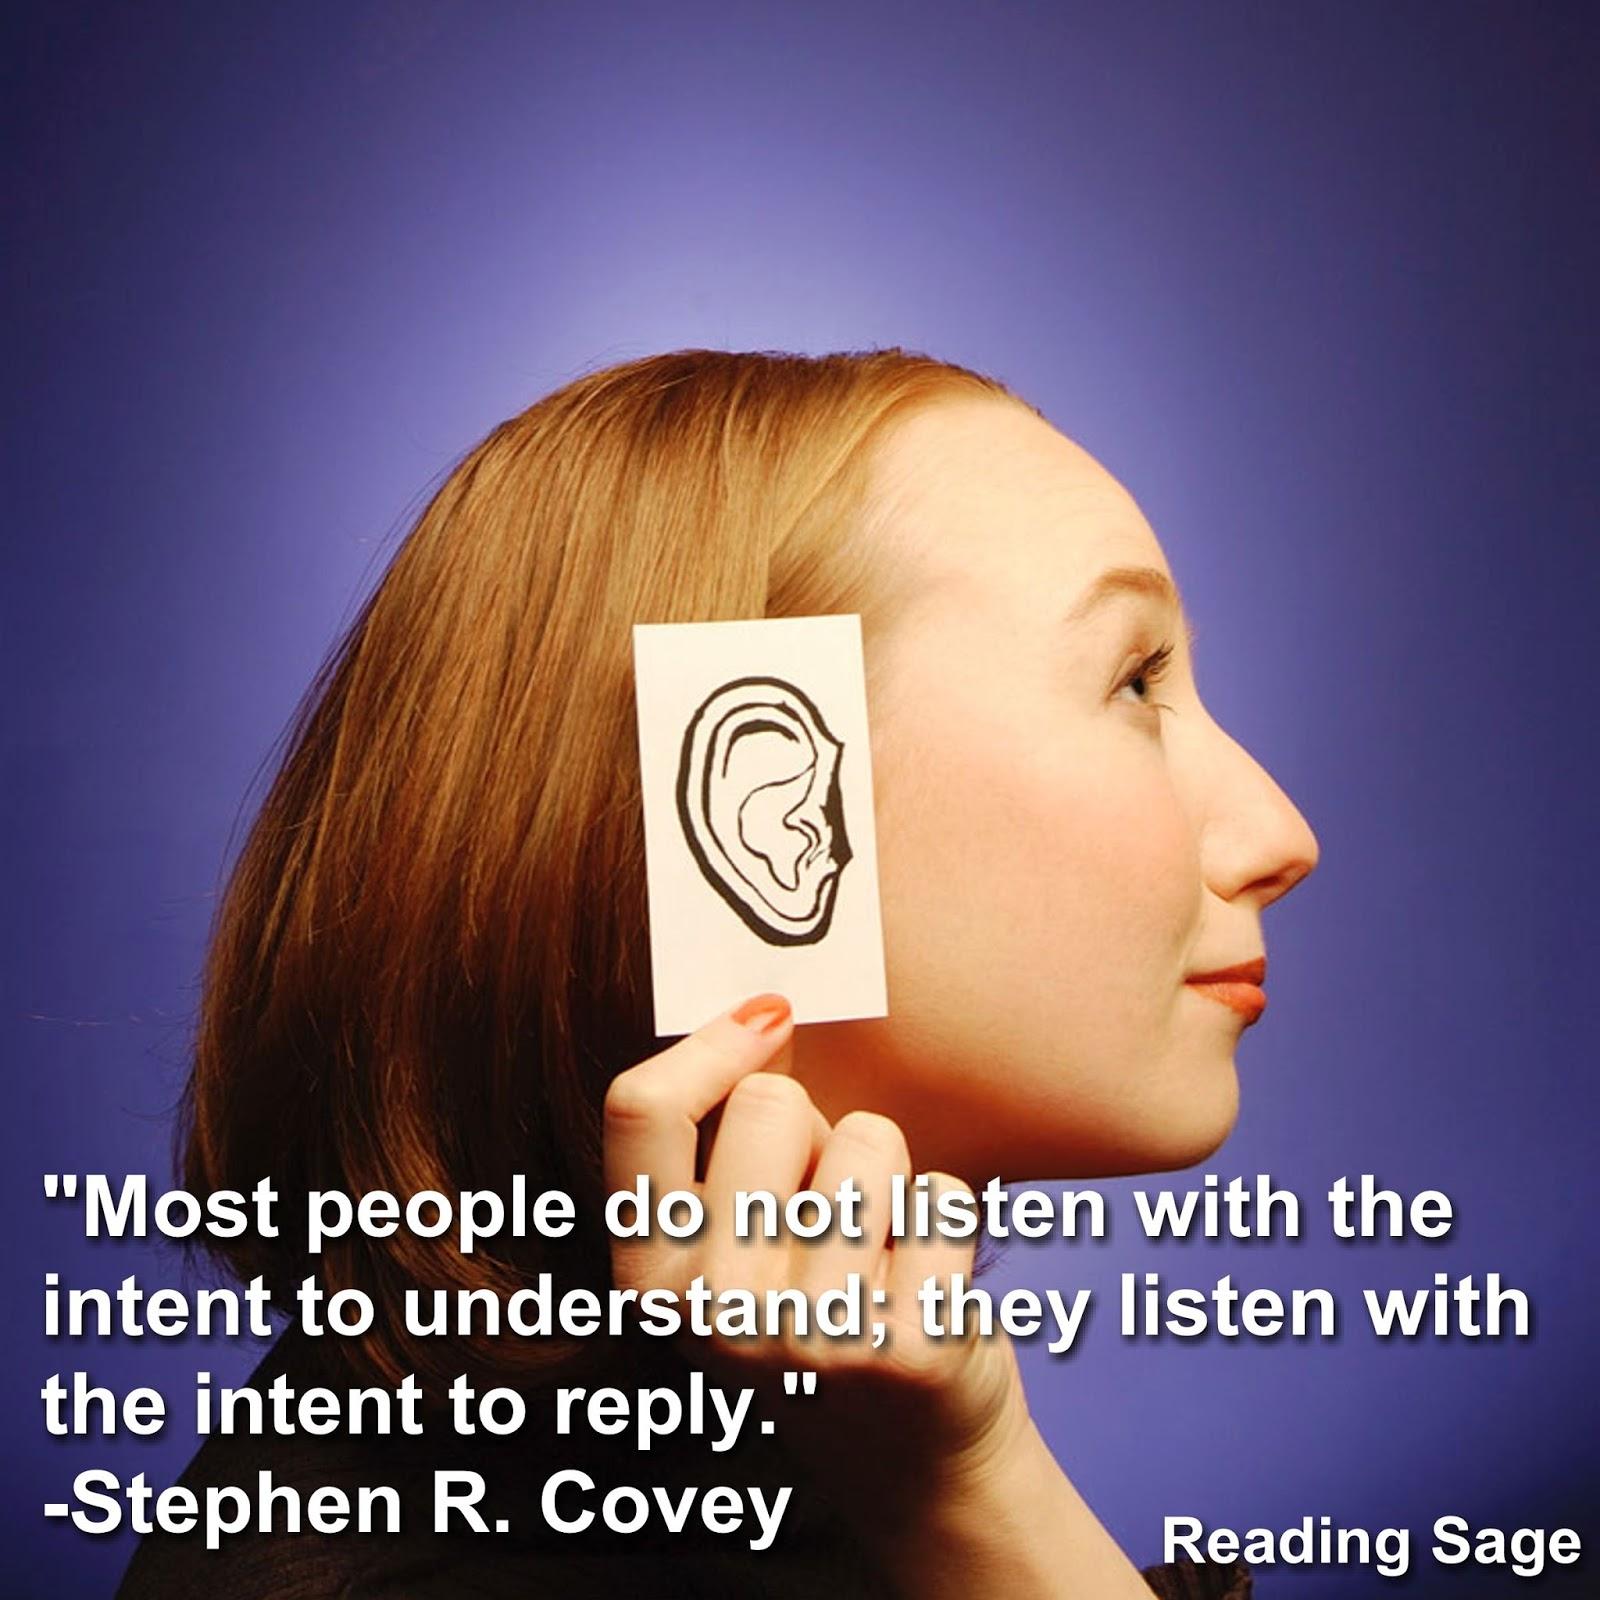 Reading Sage Help Students To Develop Focus Listening